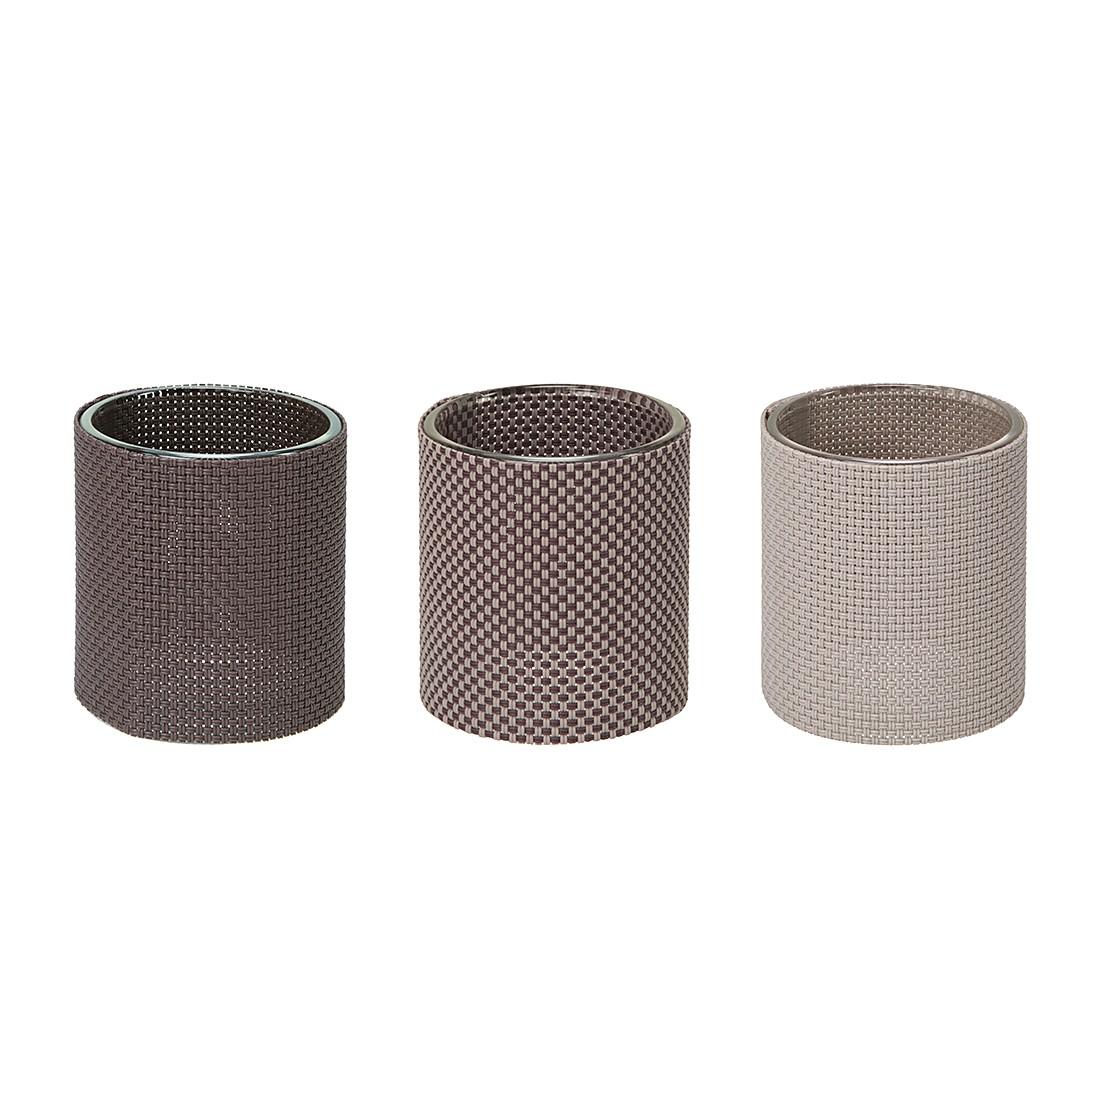 Teelichthalter Marah(3er-Set) Klarglas/Kunststoff Braun, Contento bestellen